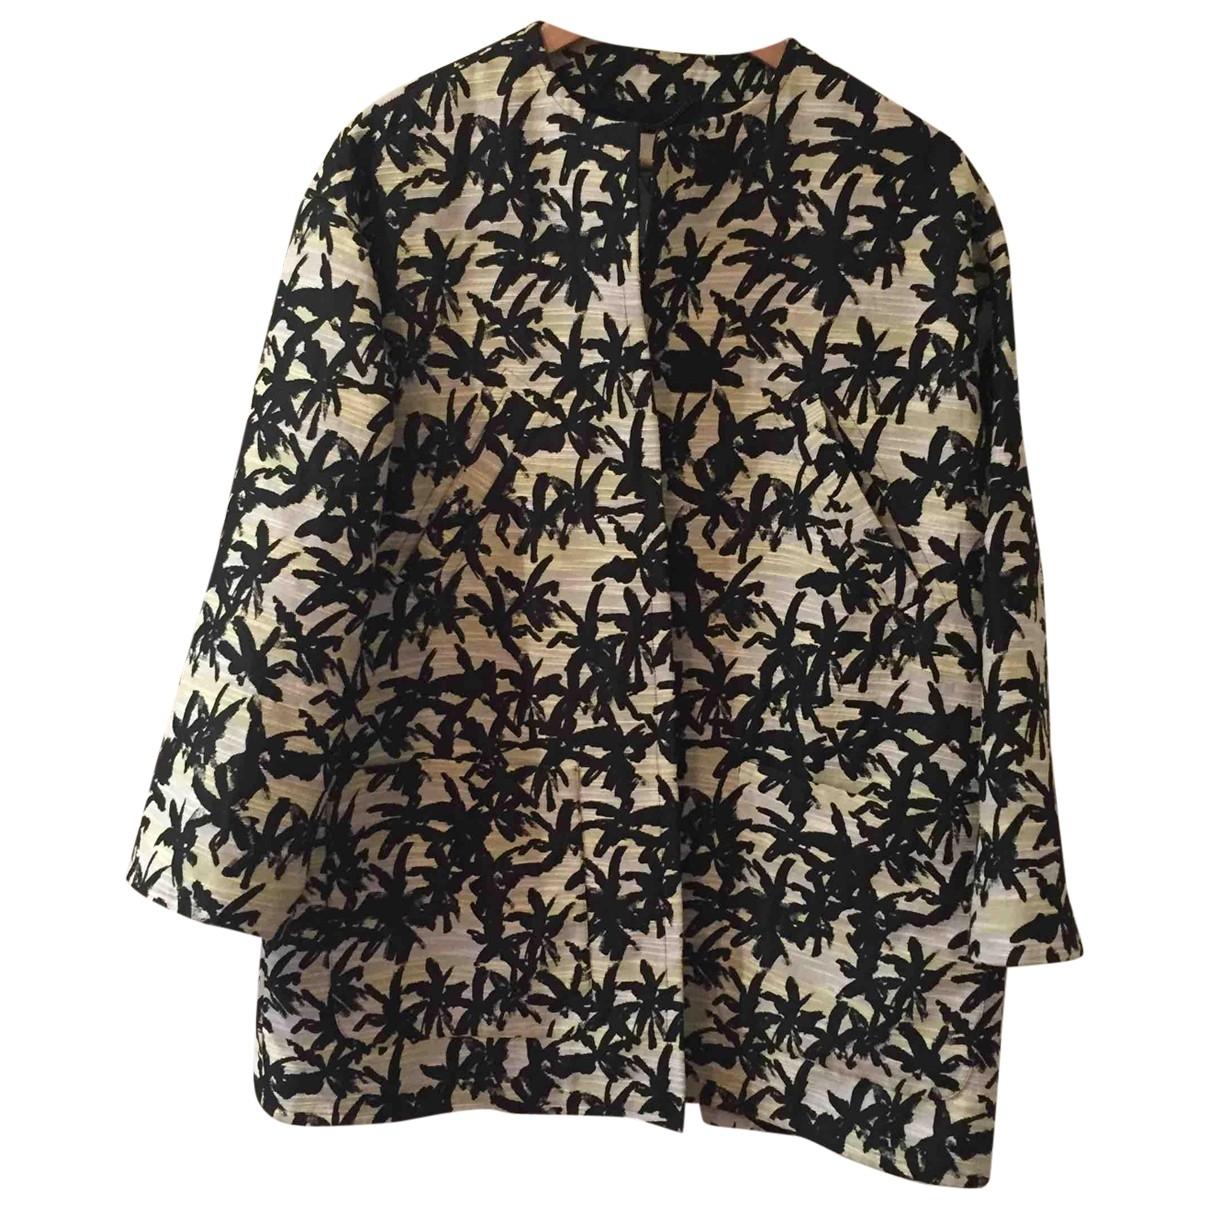 Kenzo \N jacket for Women 36 FR